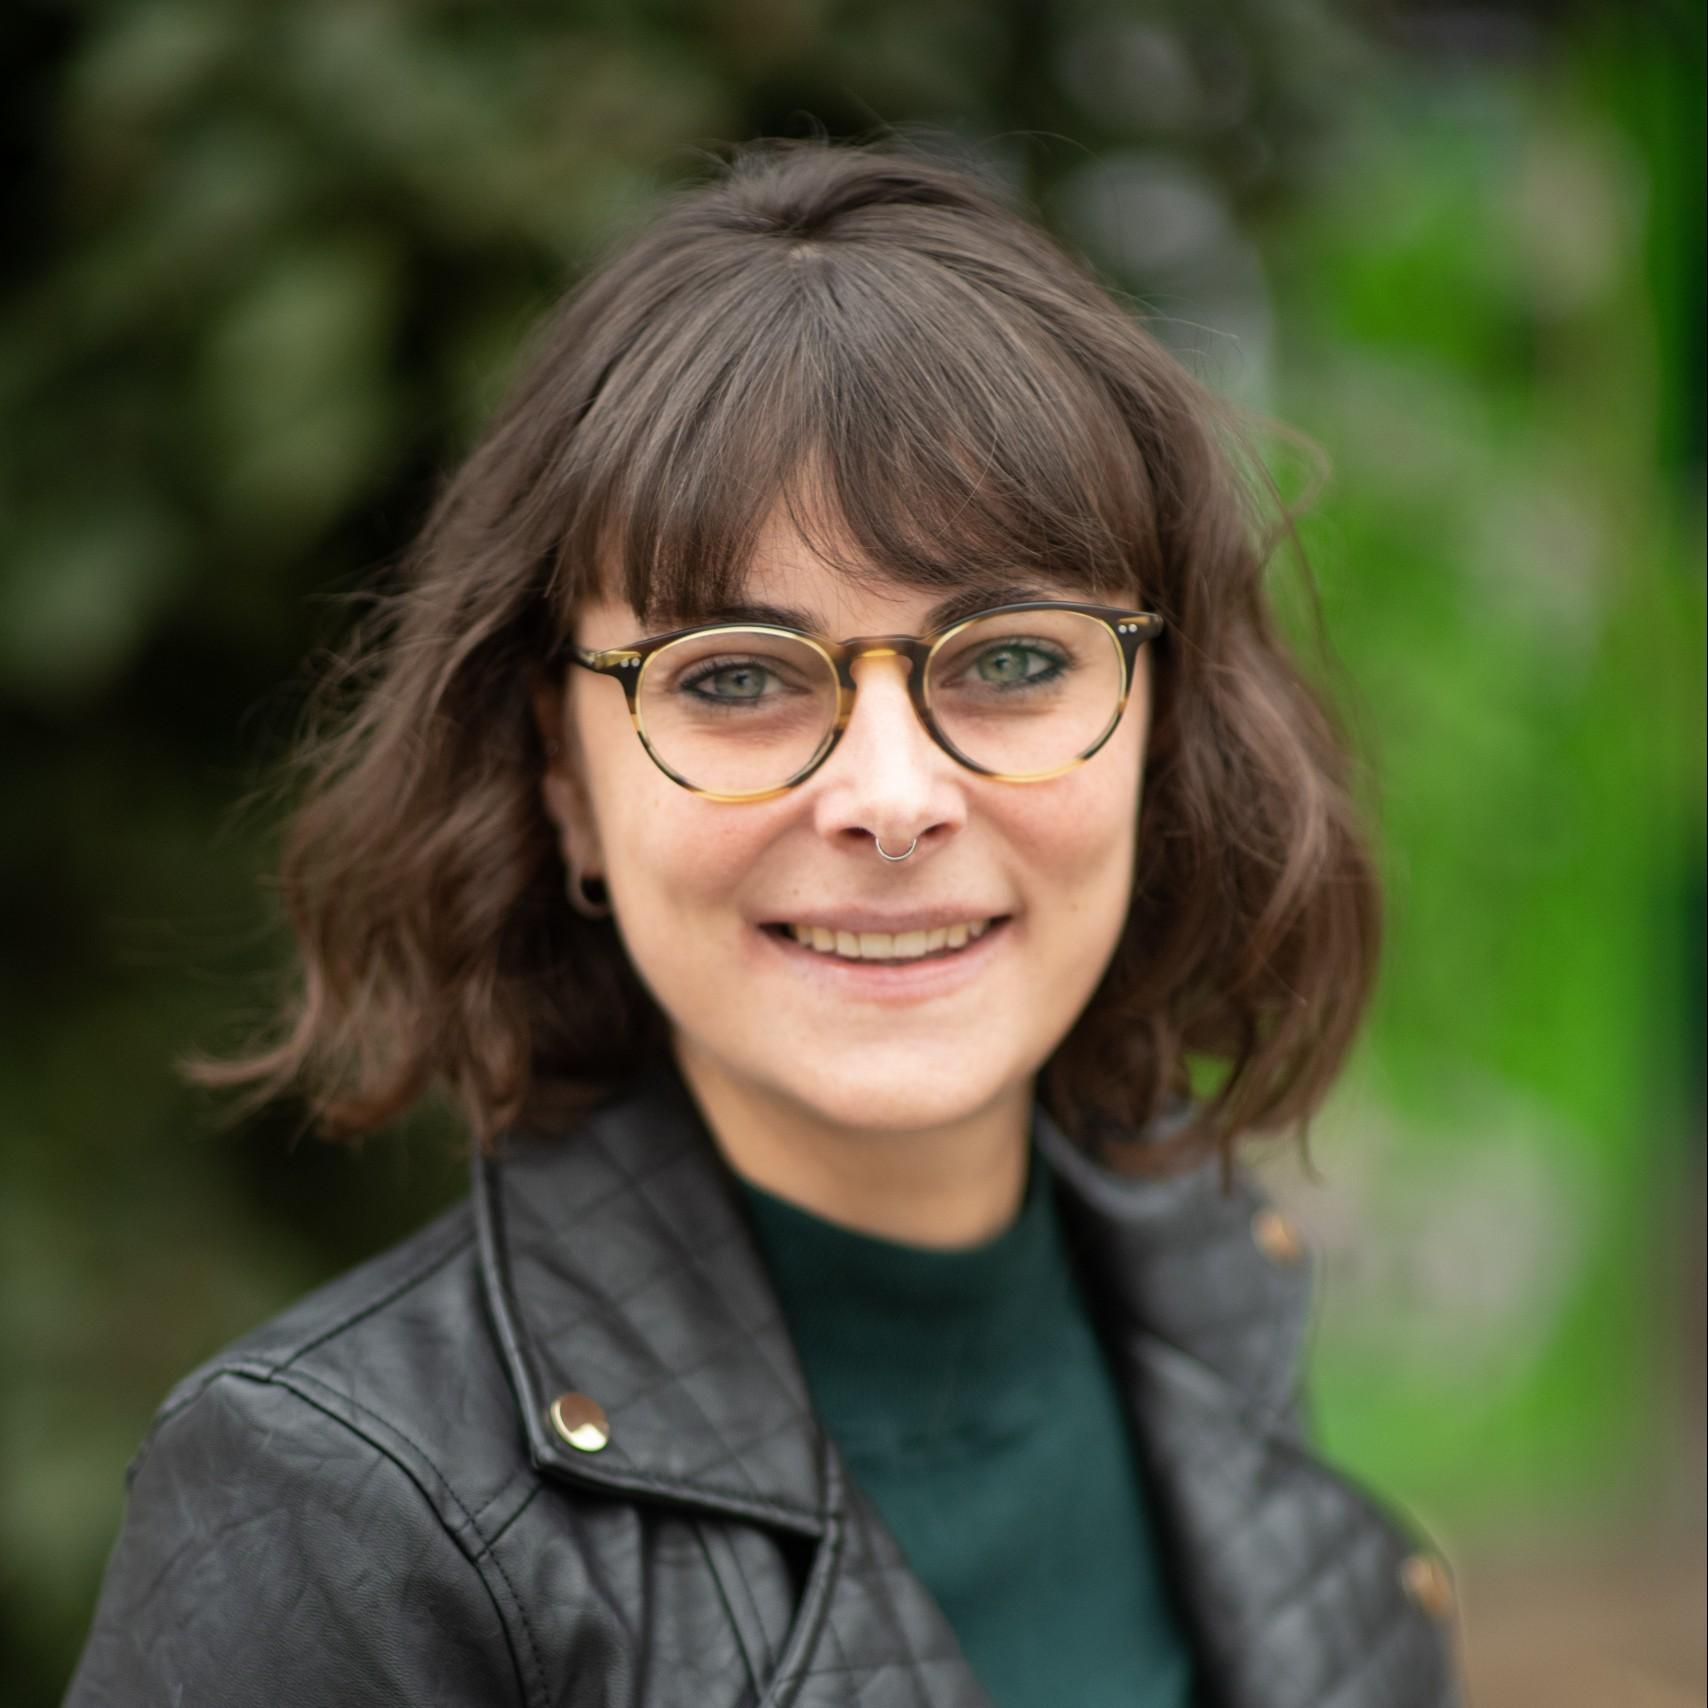 Silvia Rothmund